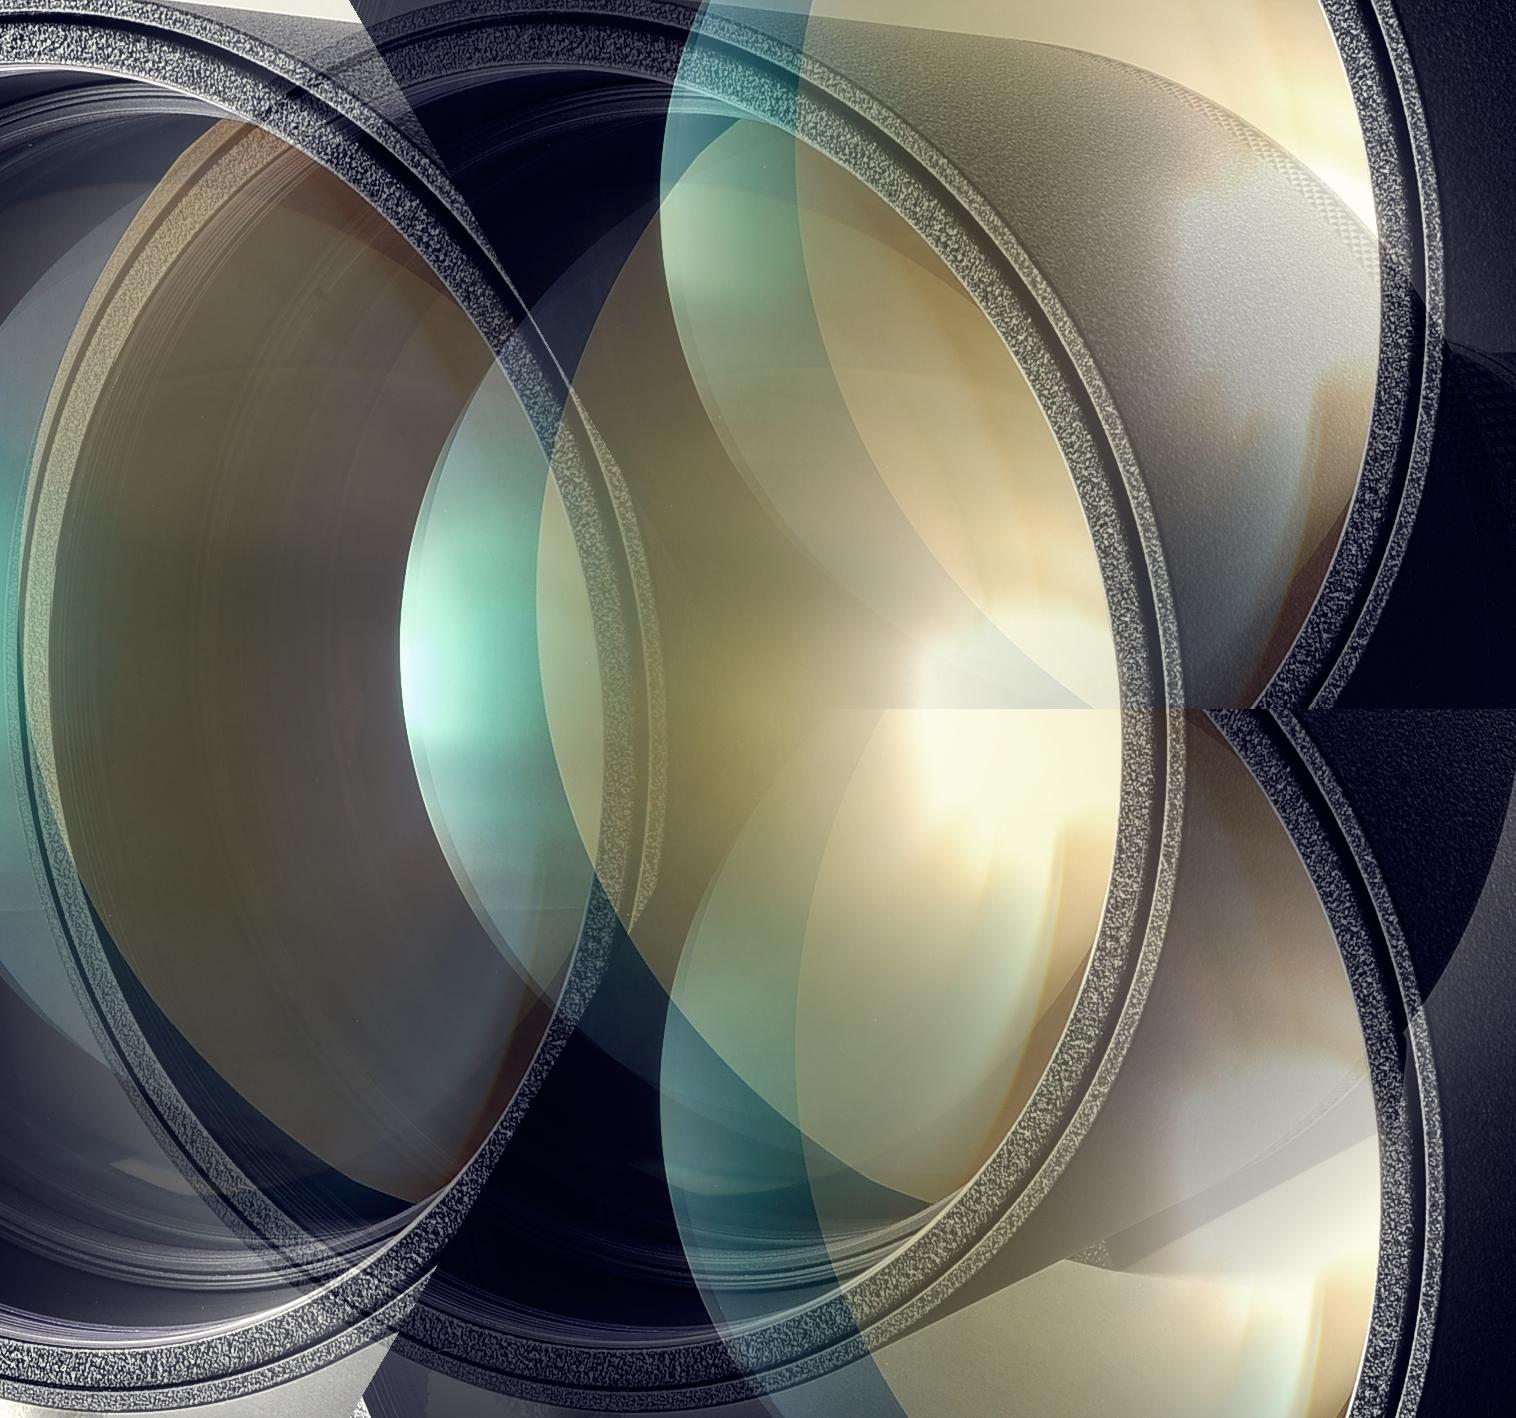 【ebay コンサル生 高額レンズ】コンサル生が一撃で利益16万円!!フィルム系の長玉レンズです。